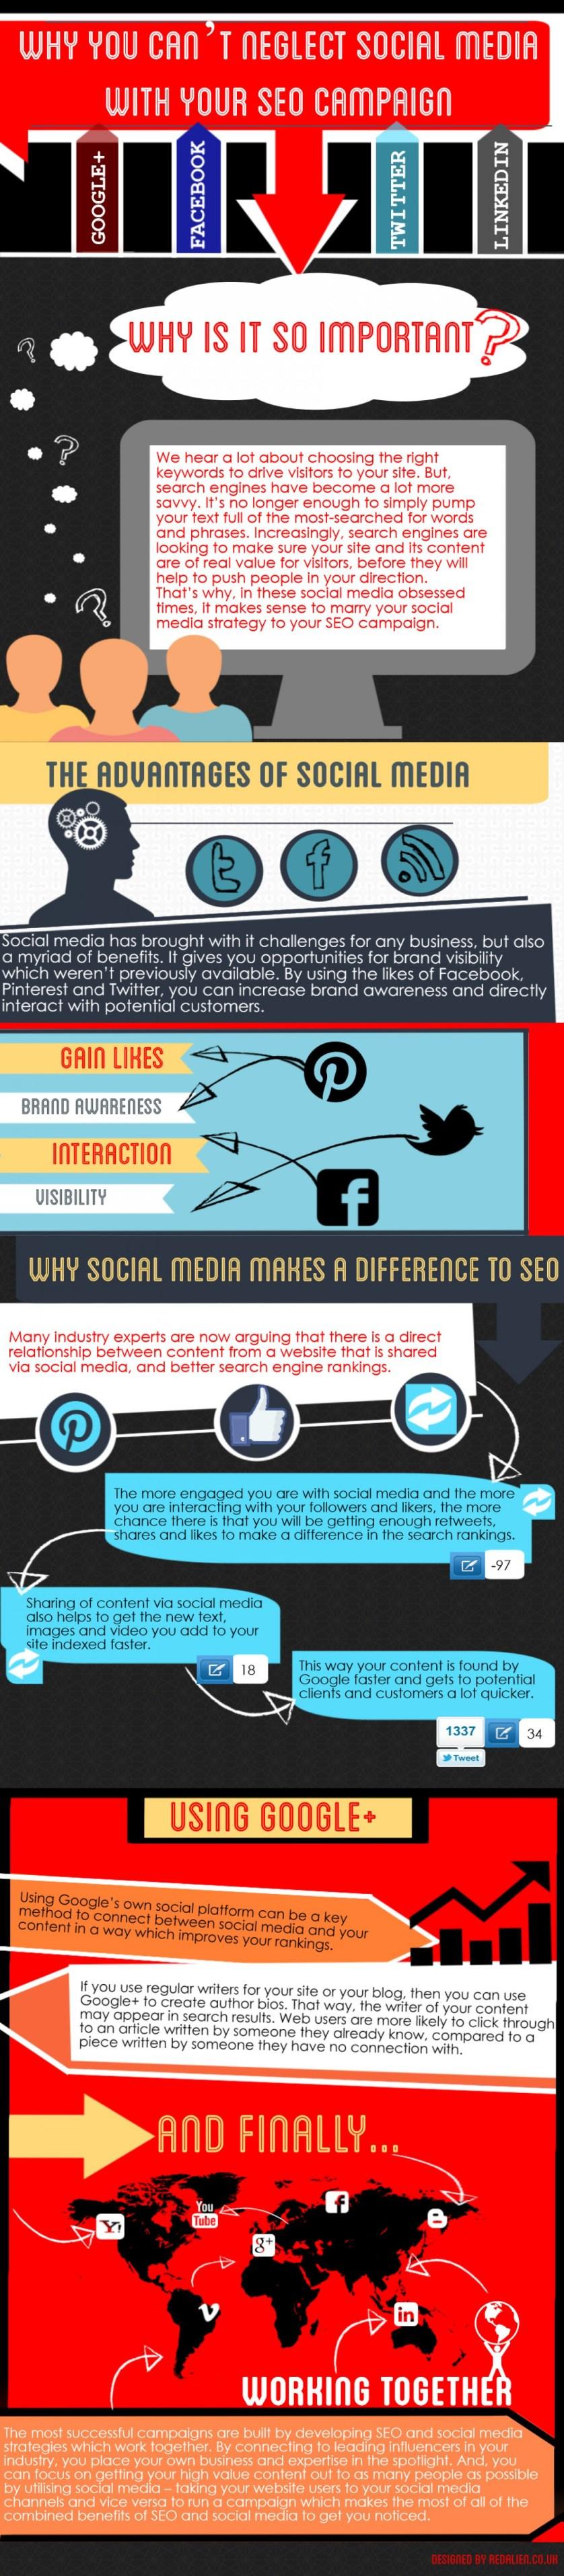 SEO, social media, tips, infographic,